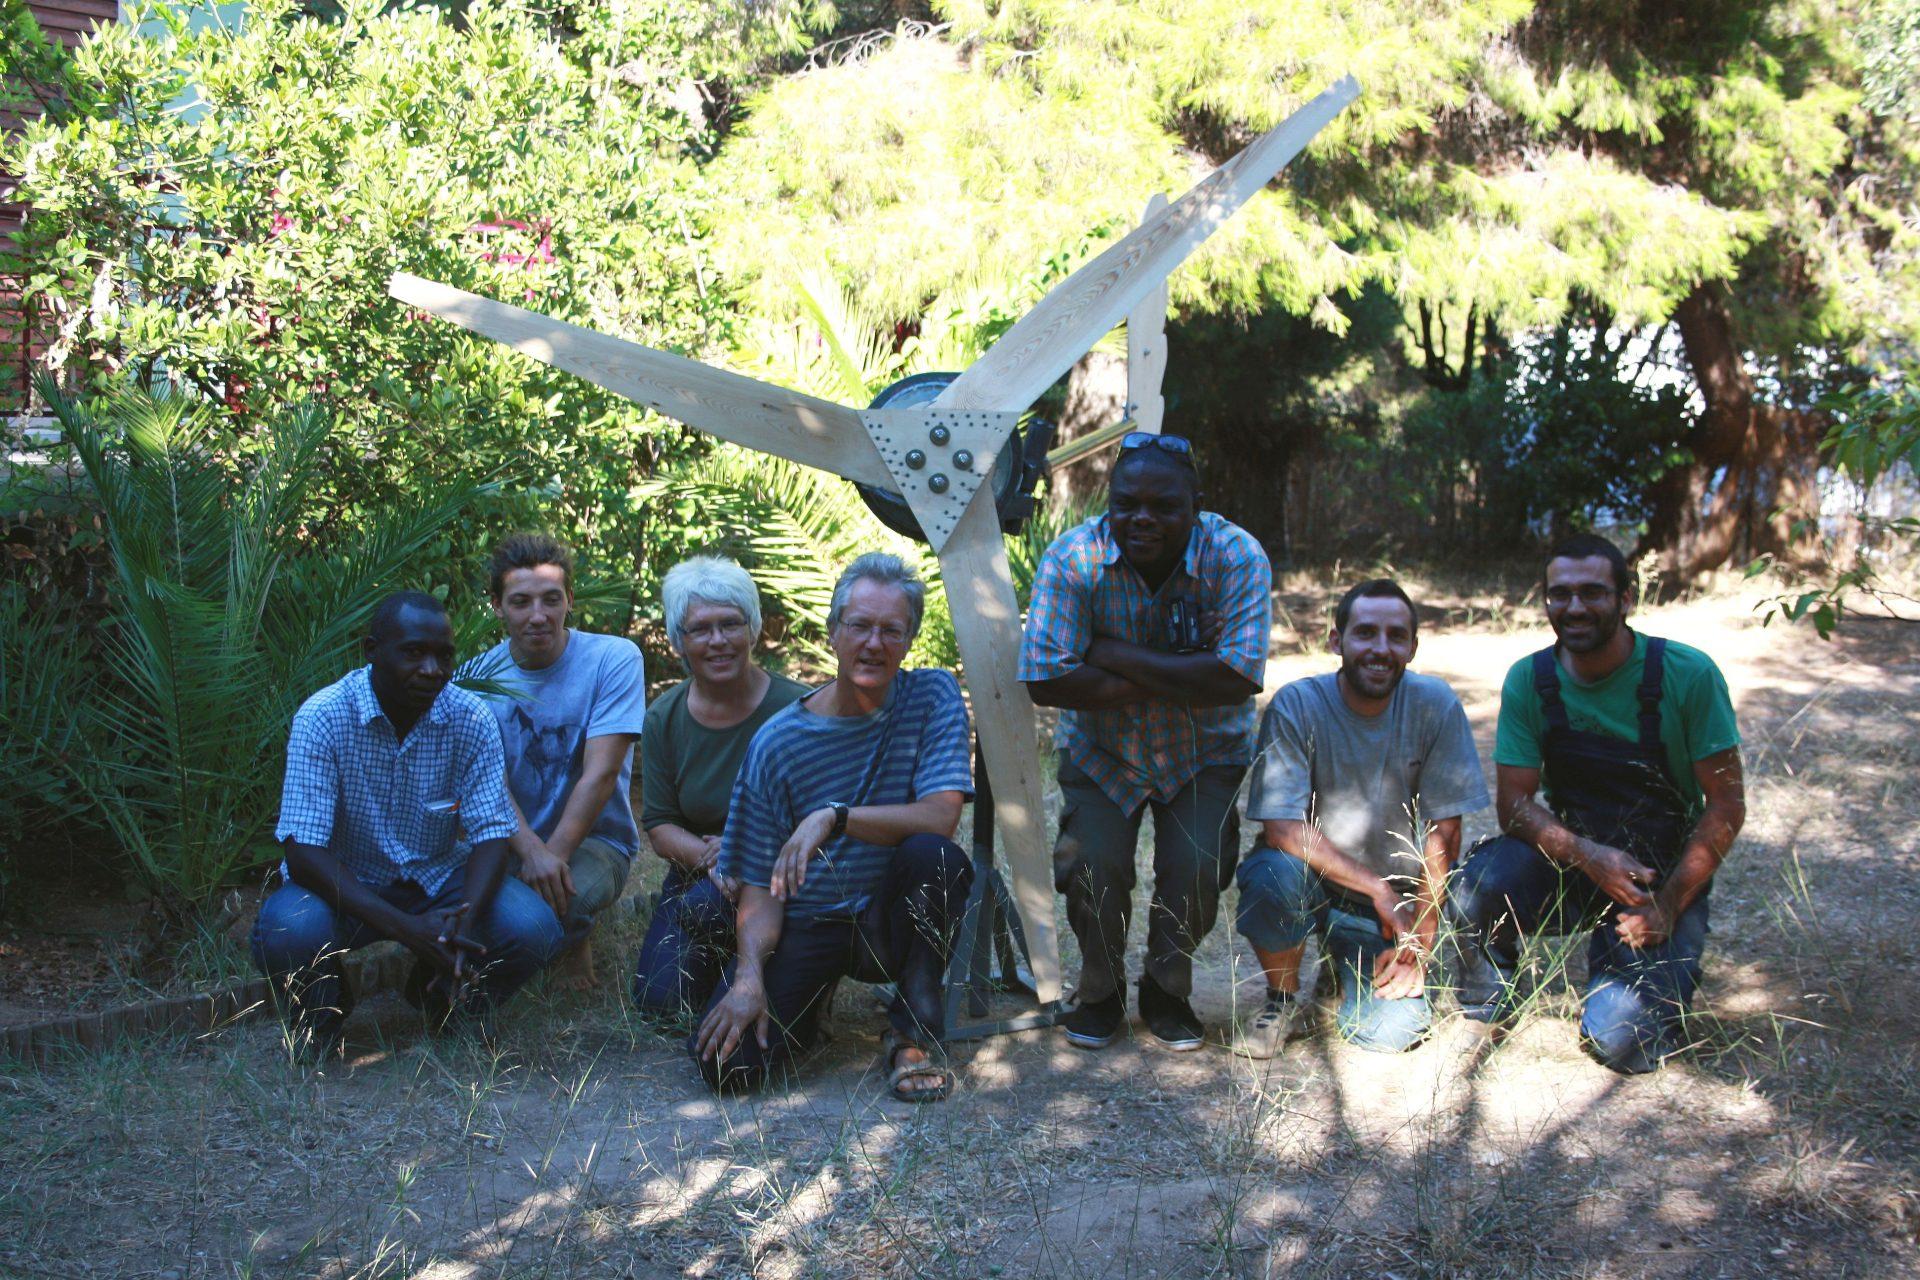 group photo with turbine